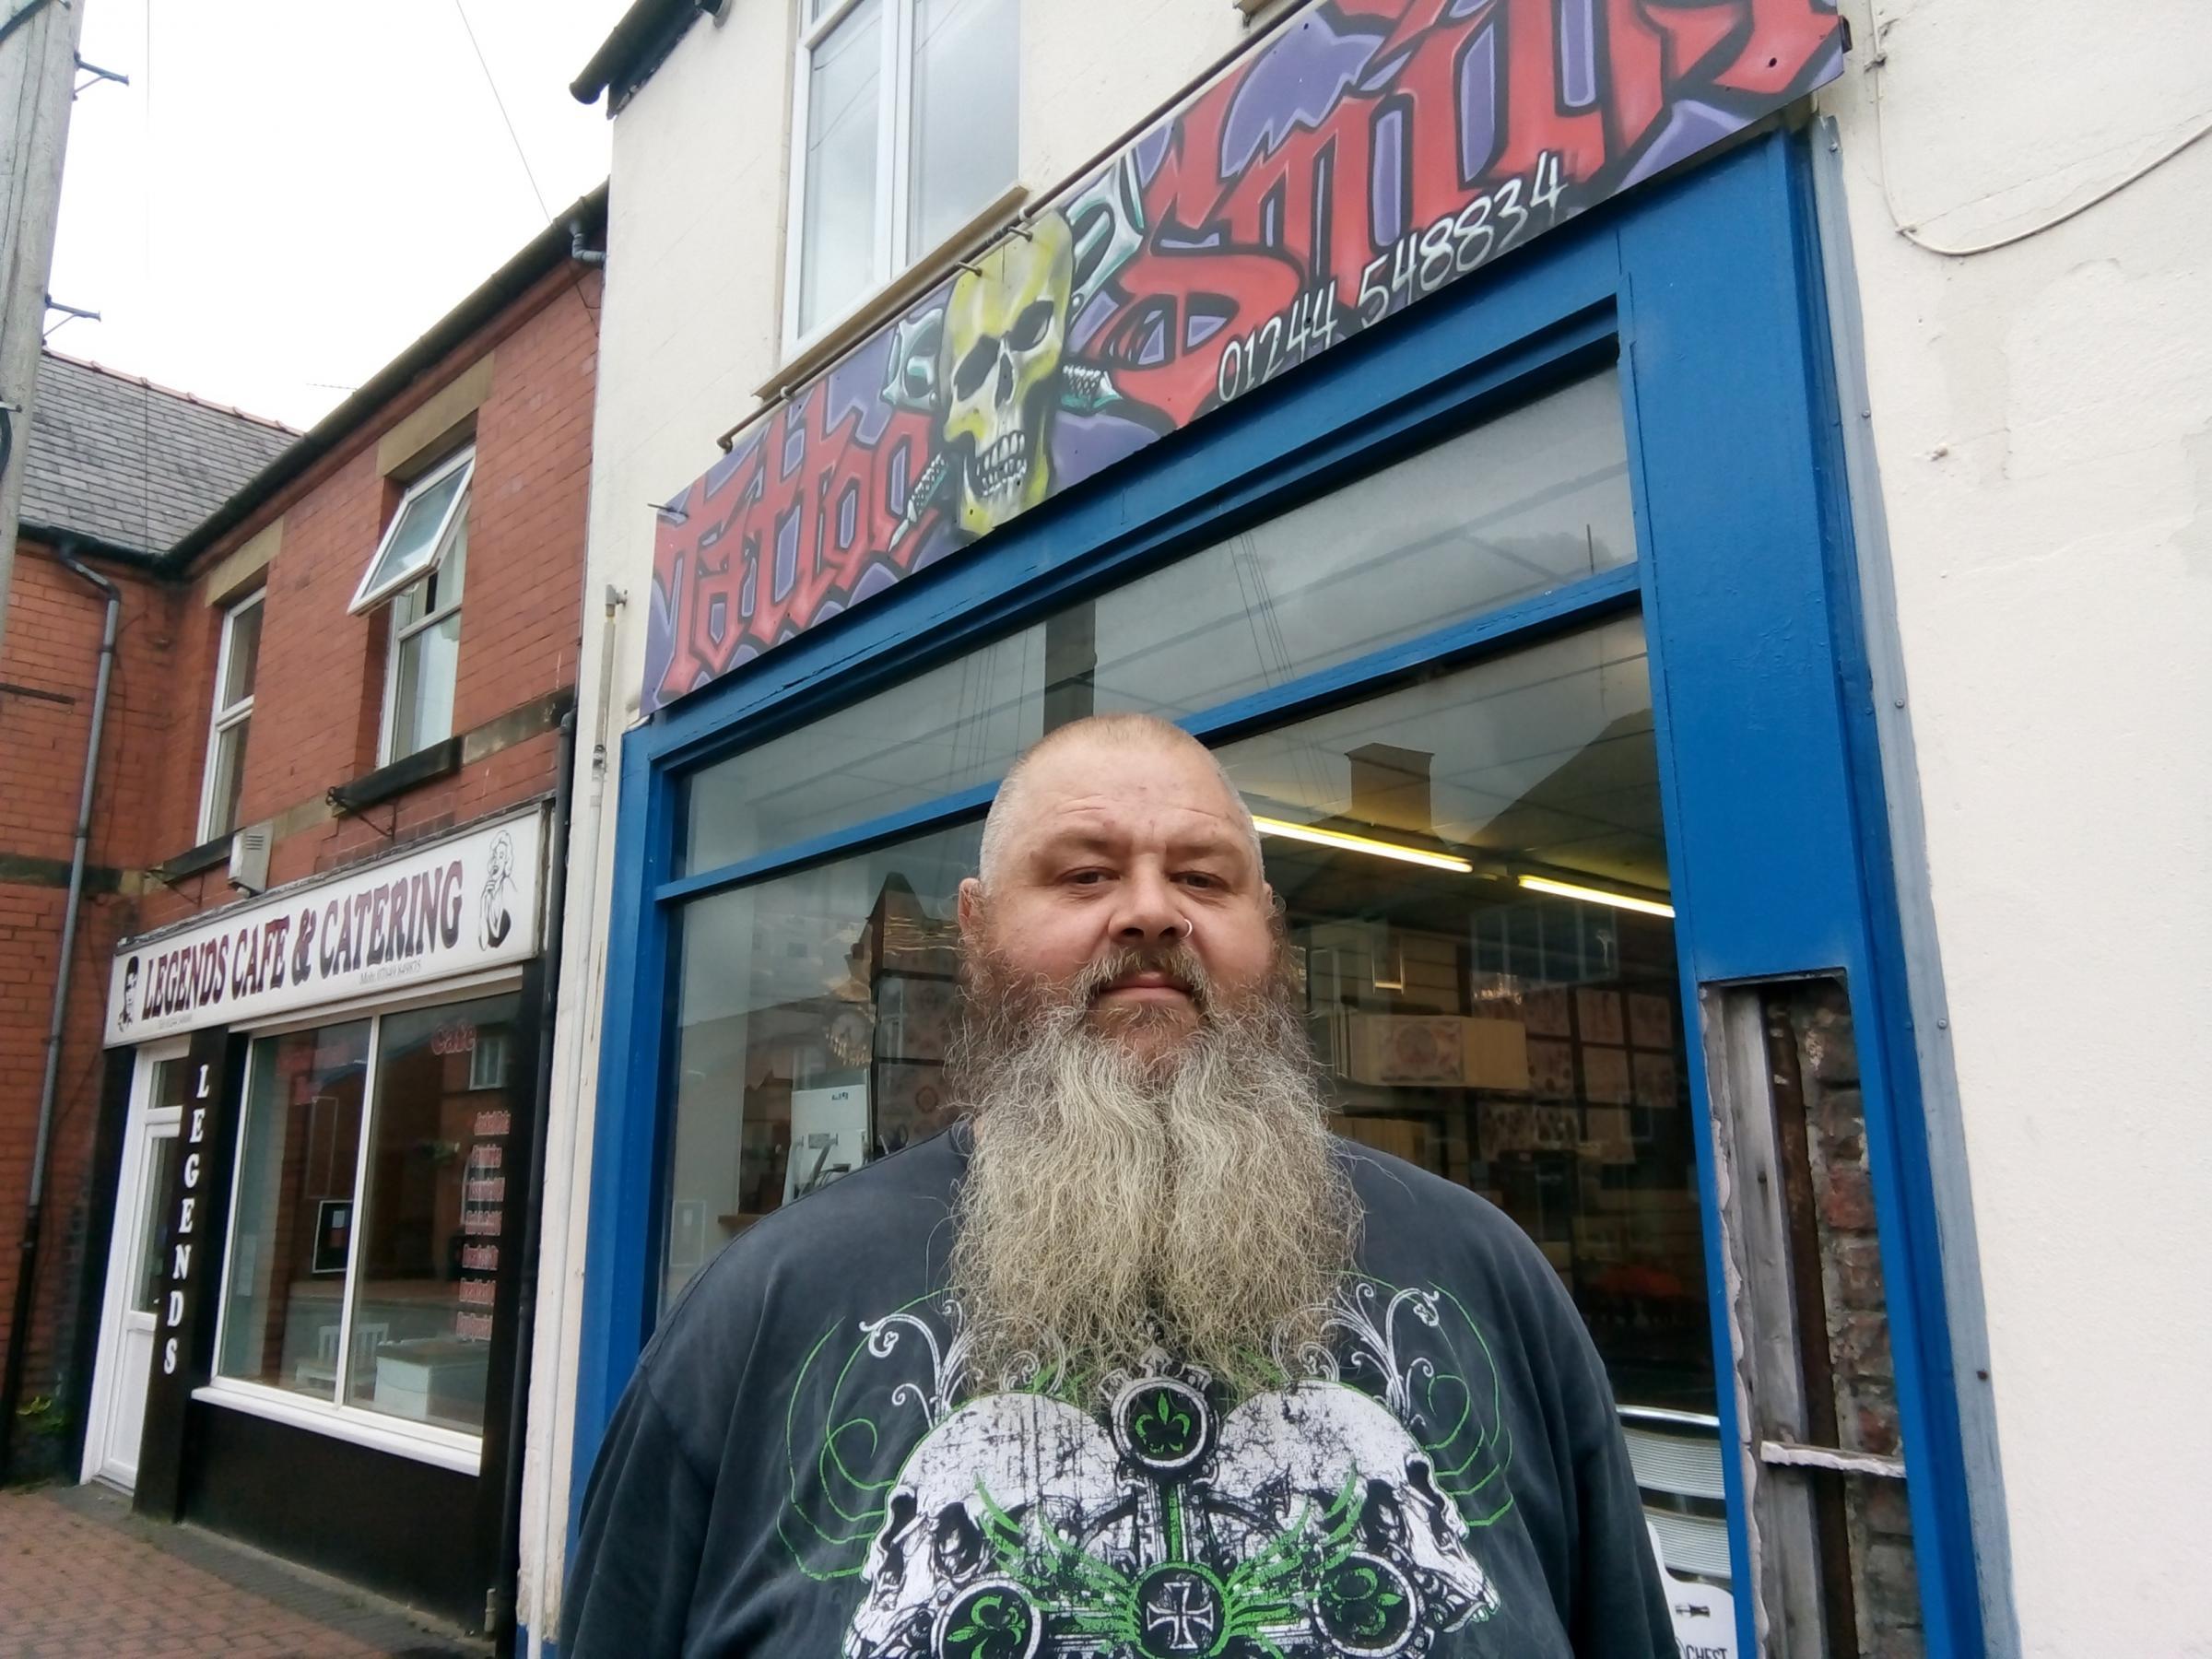 Buckley businessman seeks permission to turn tattoo studio into homes